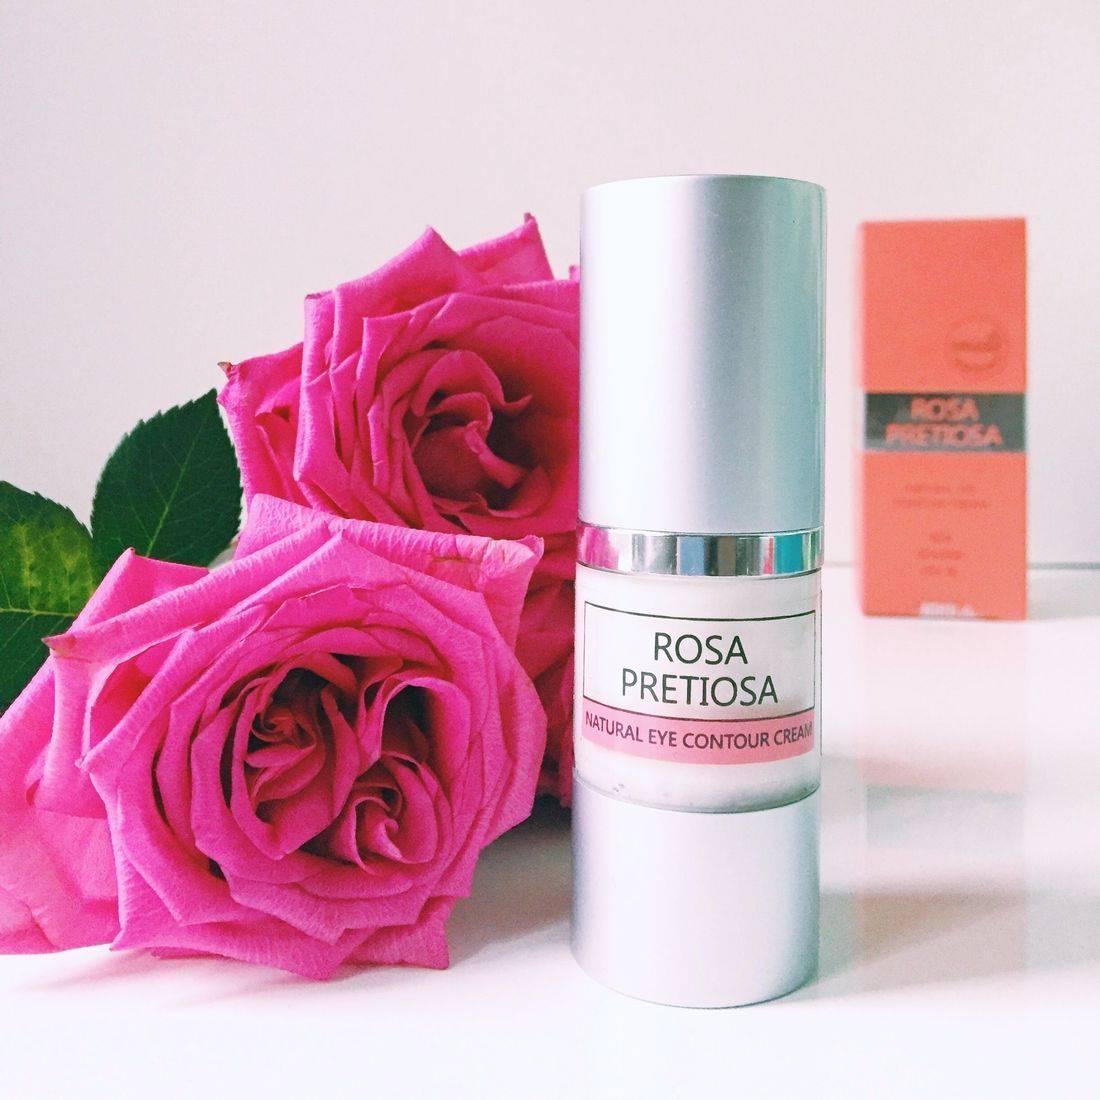 Rosa Pretiosa Natural Contour Eye Cream, Rose Eye Cream, rose eye cream, non toxic eye contour cream